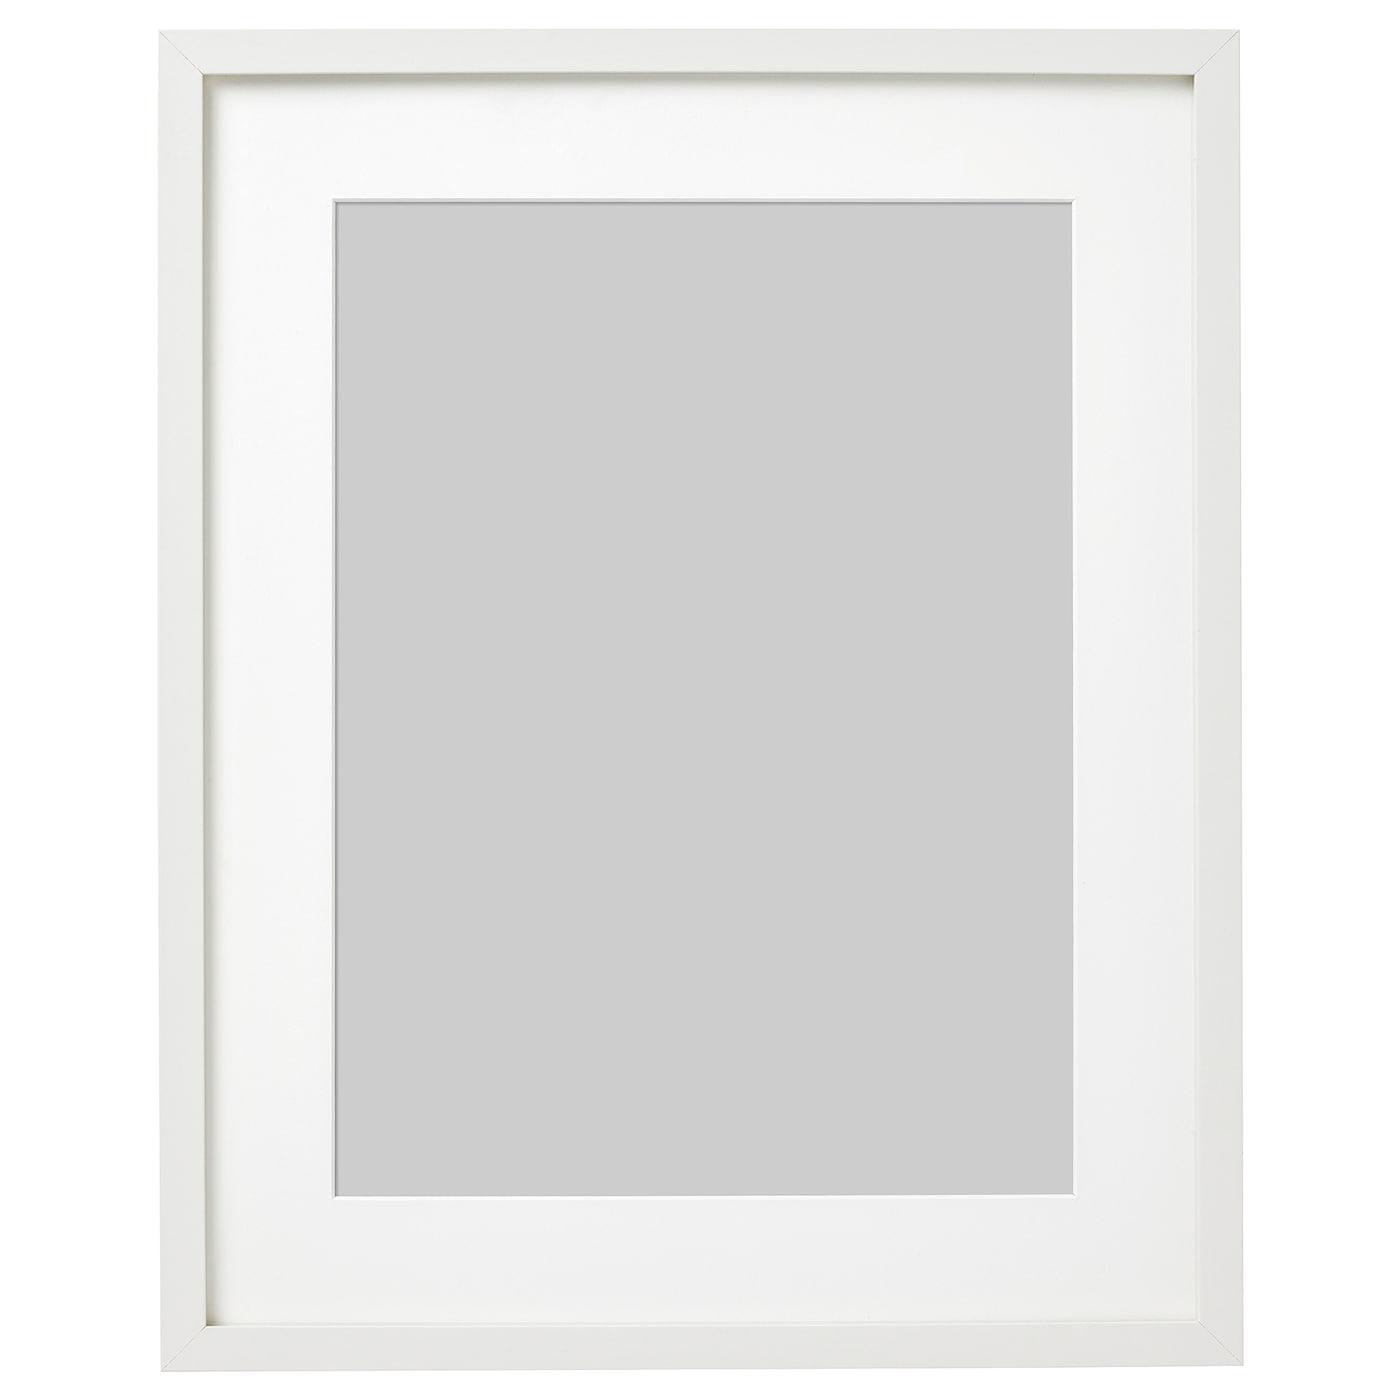 Ikea Orlando Large Family Showroom Scenario: RIBBA Frame White 40 X 50 Cm